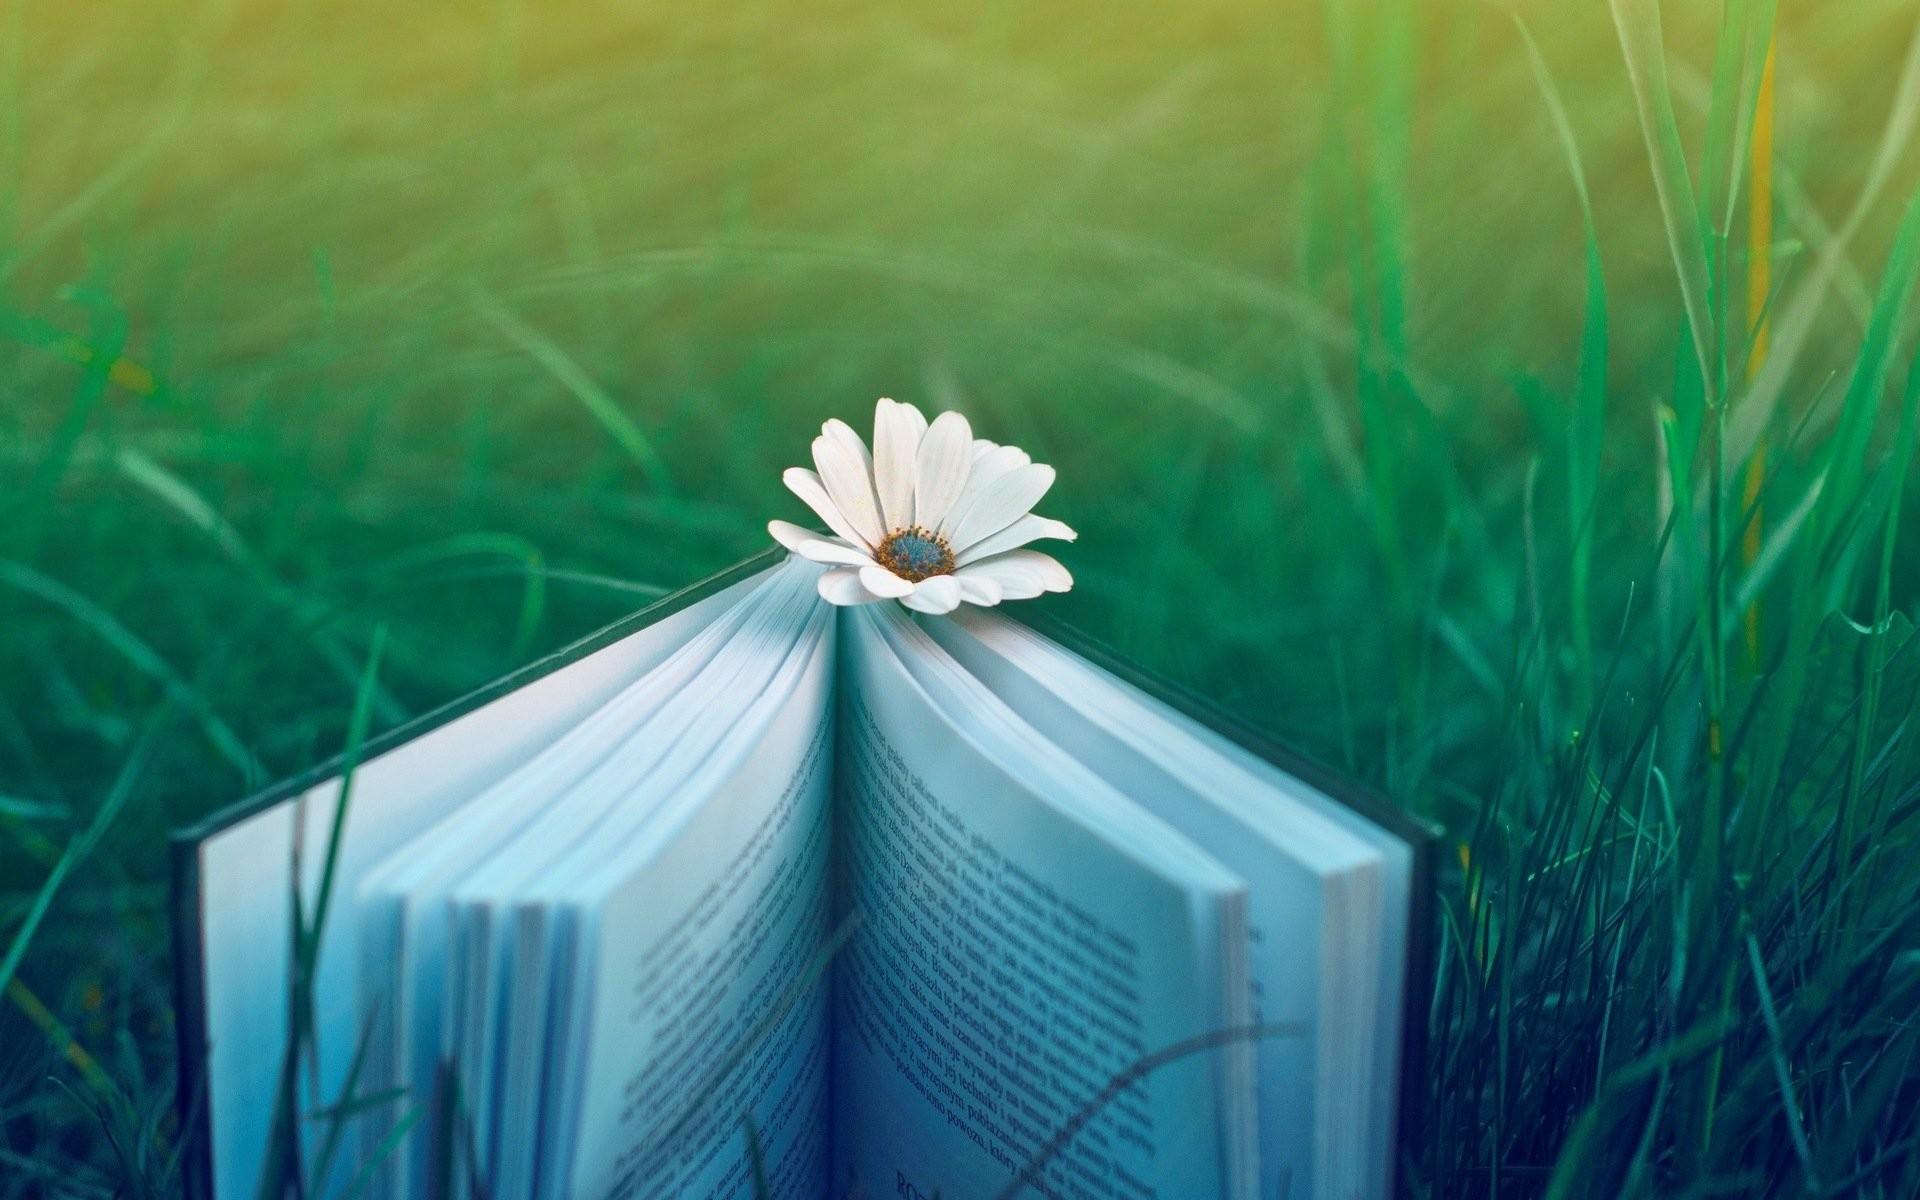 Books 540803